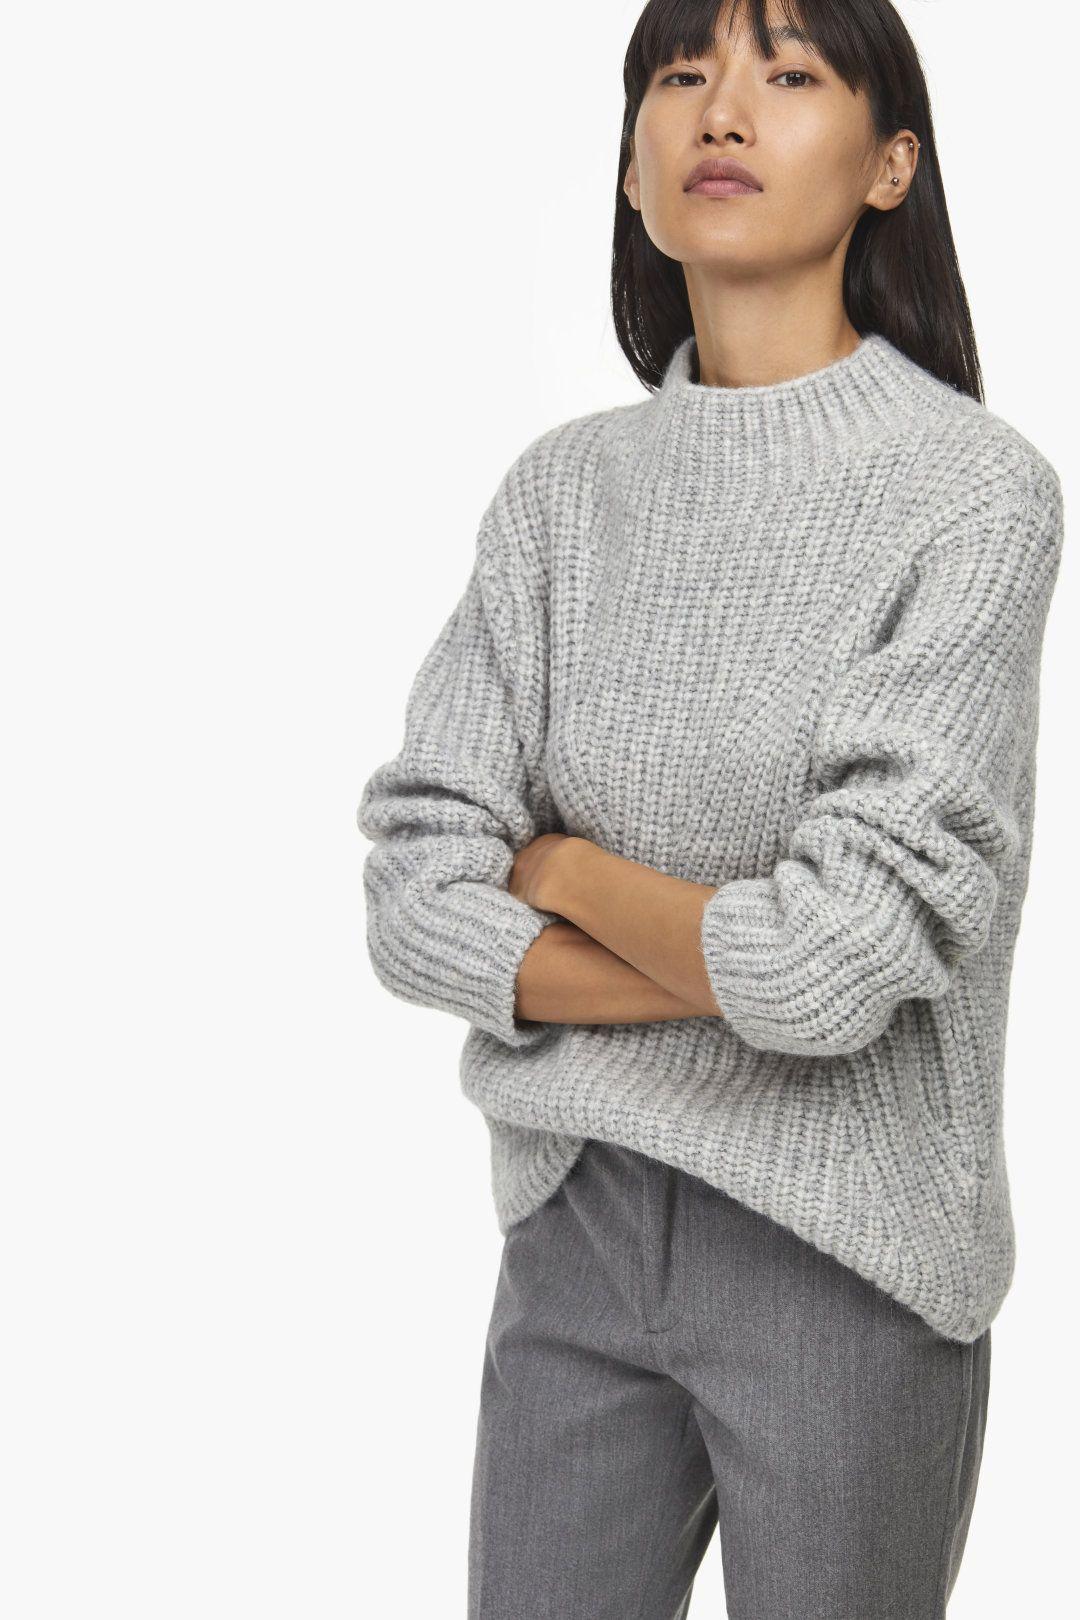 86bace0d14b6 Royal Baby Alpaca Mix Heavy Knit Sweater